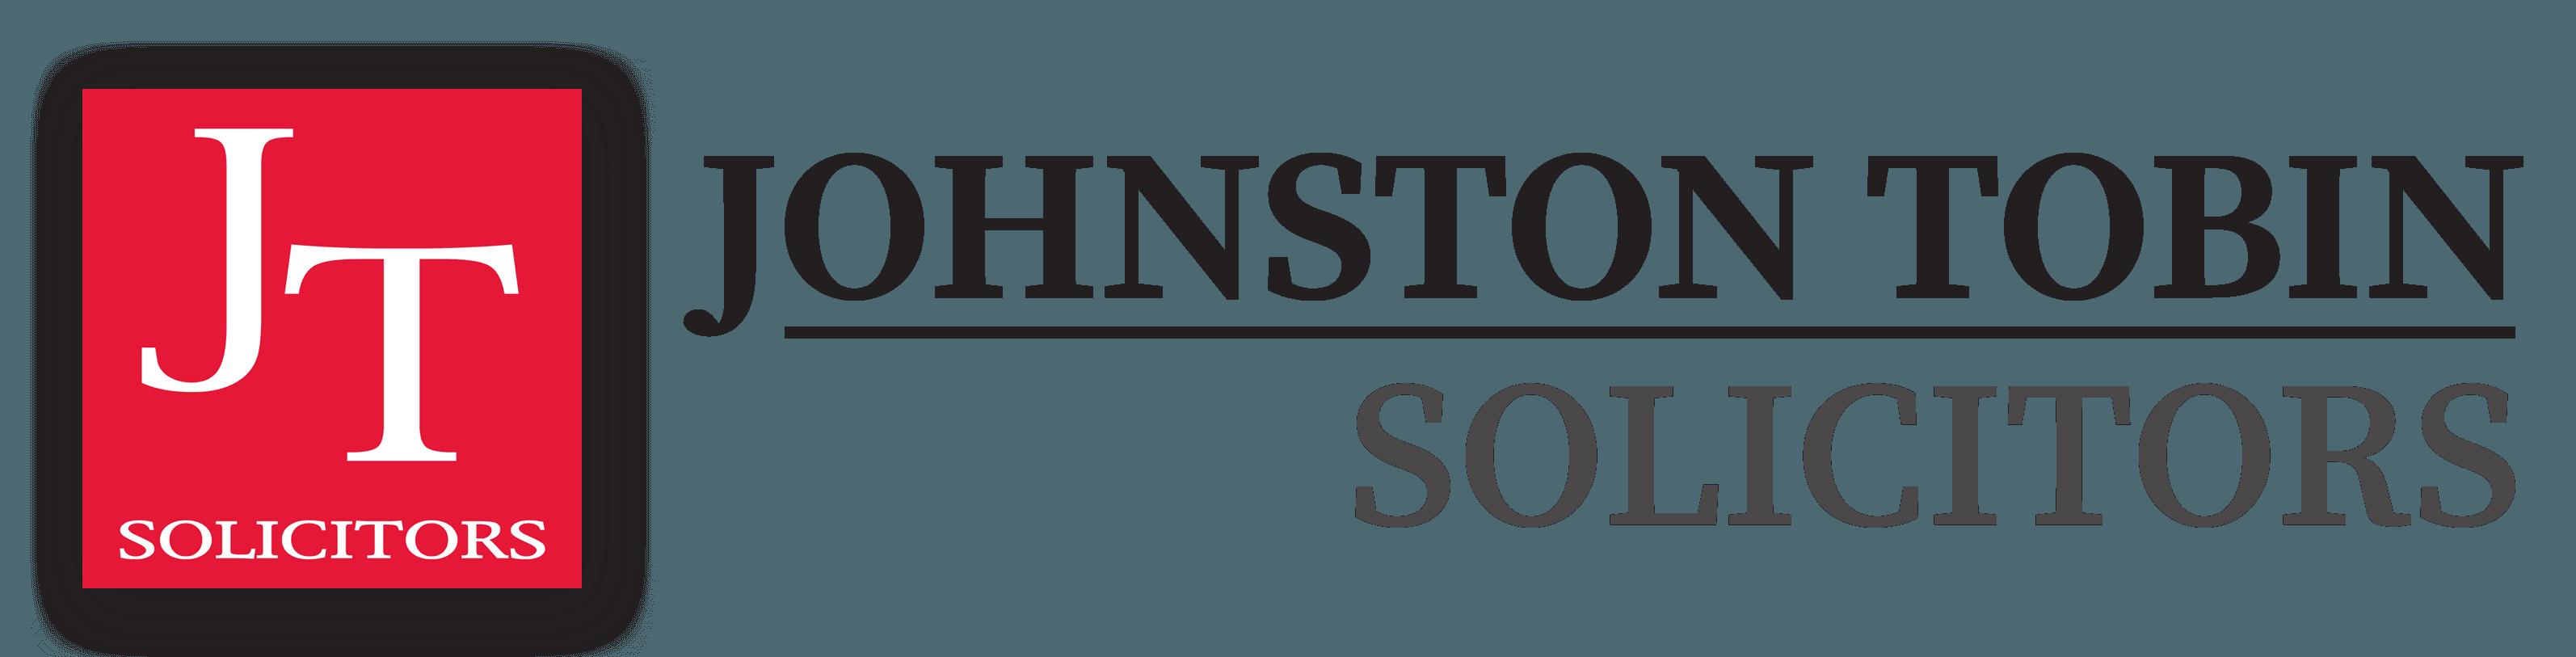 Johnston Tobin Solicitors